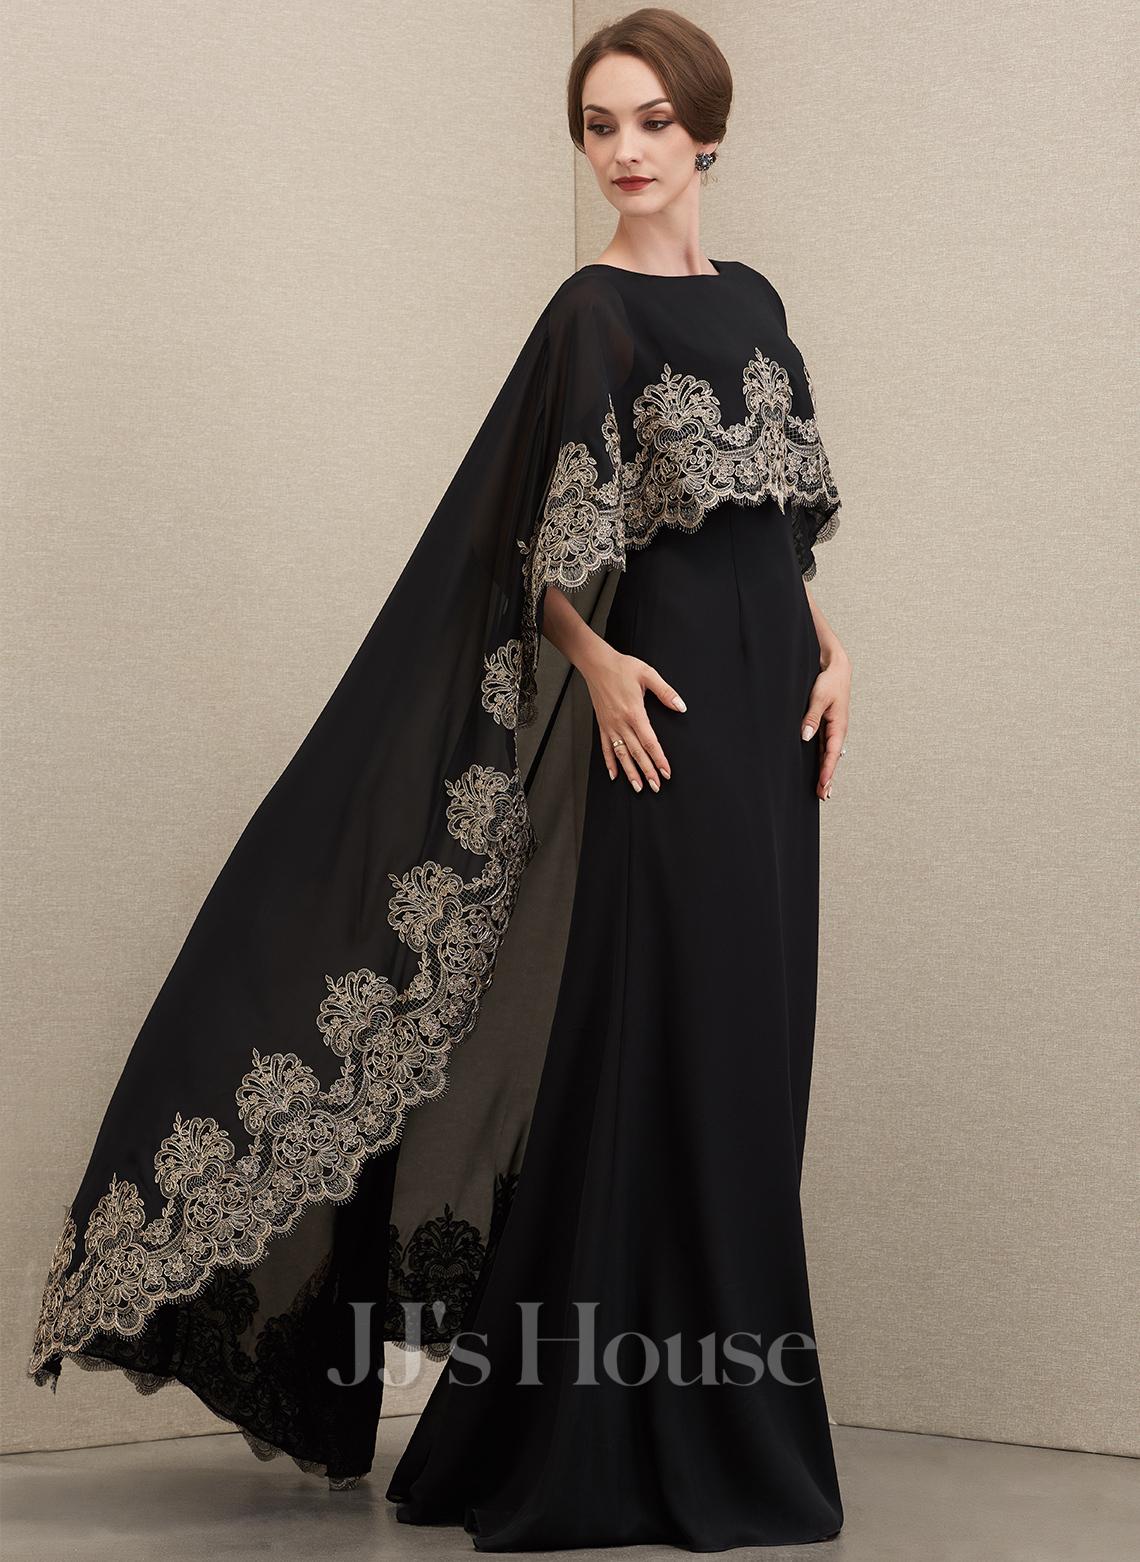 Corte A Decote redondo Longos Tecido de seda Renda Vestido para a mãe da noiva